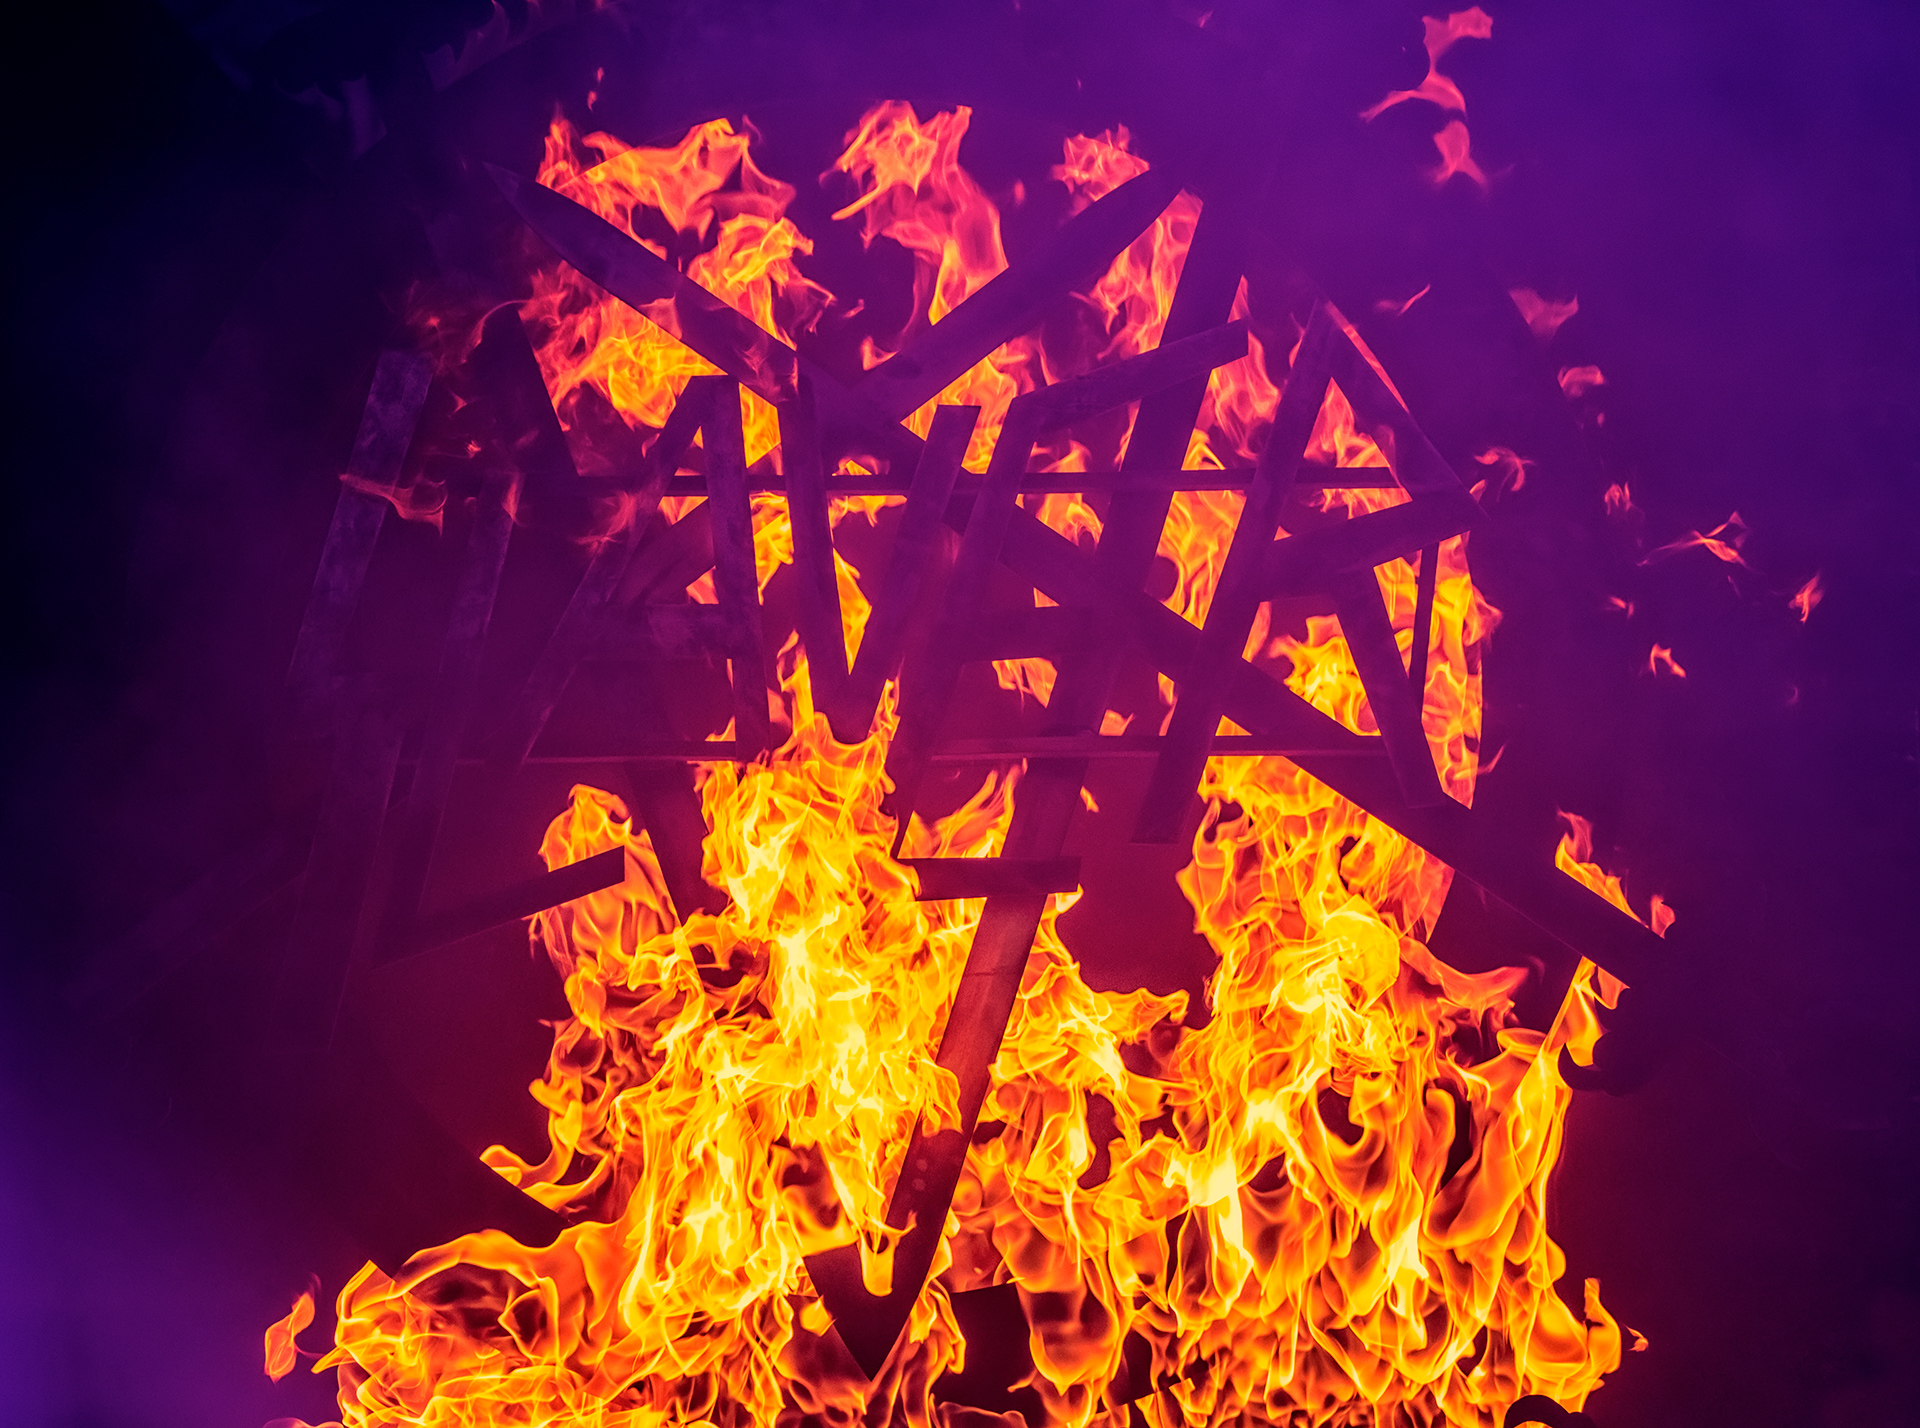 Slayer, band, Tuska metal festival, fire